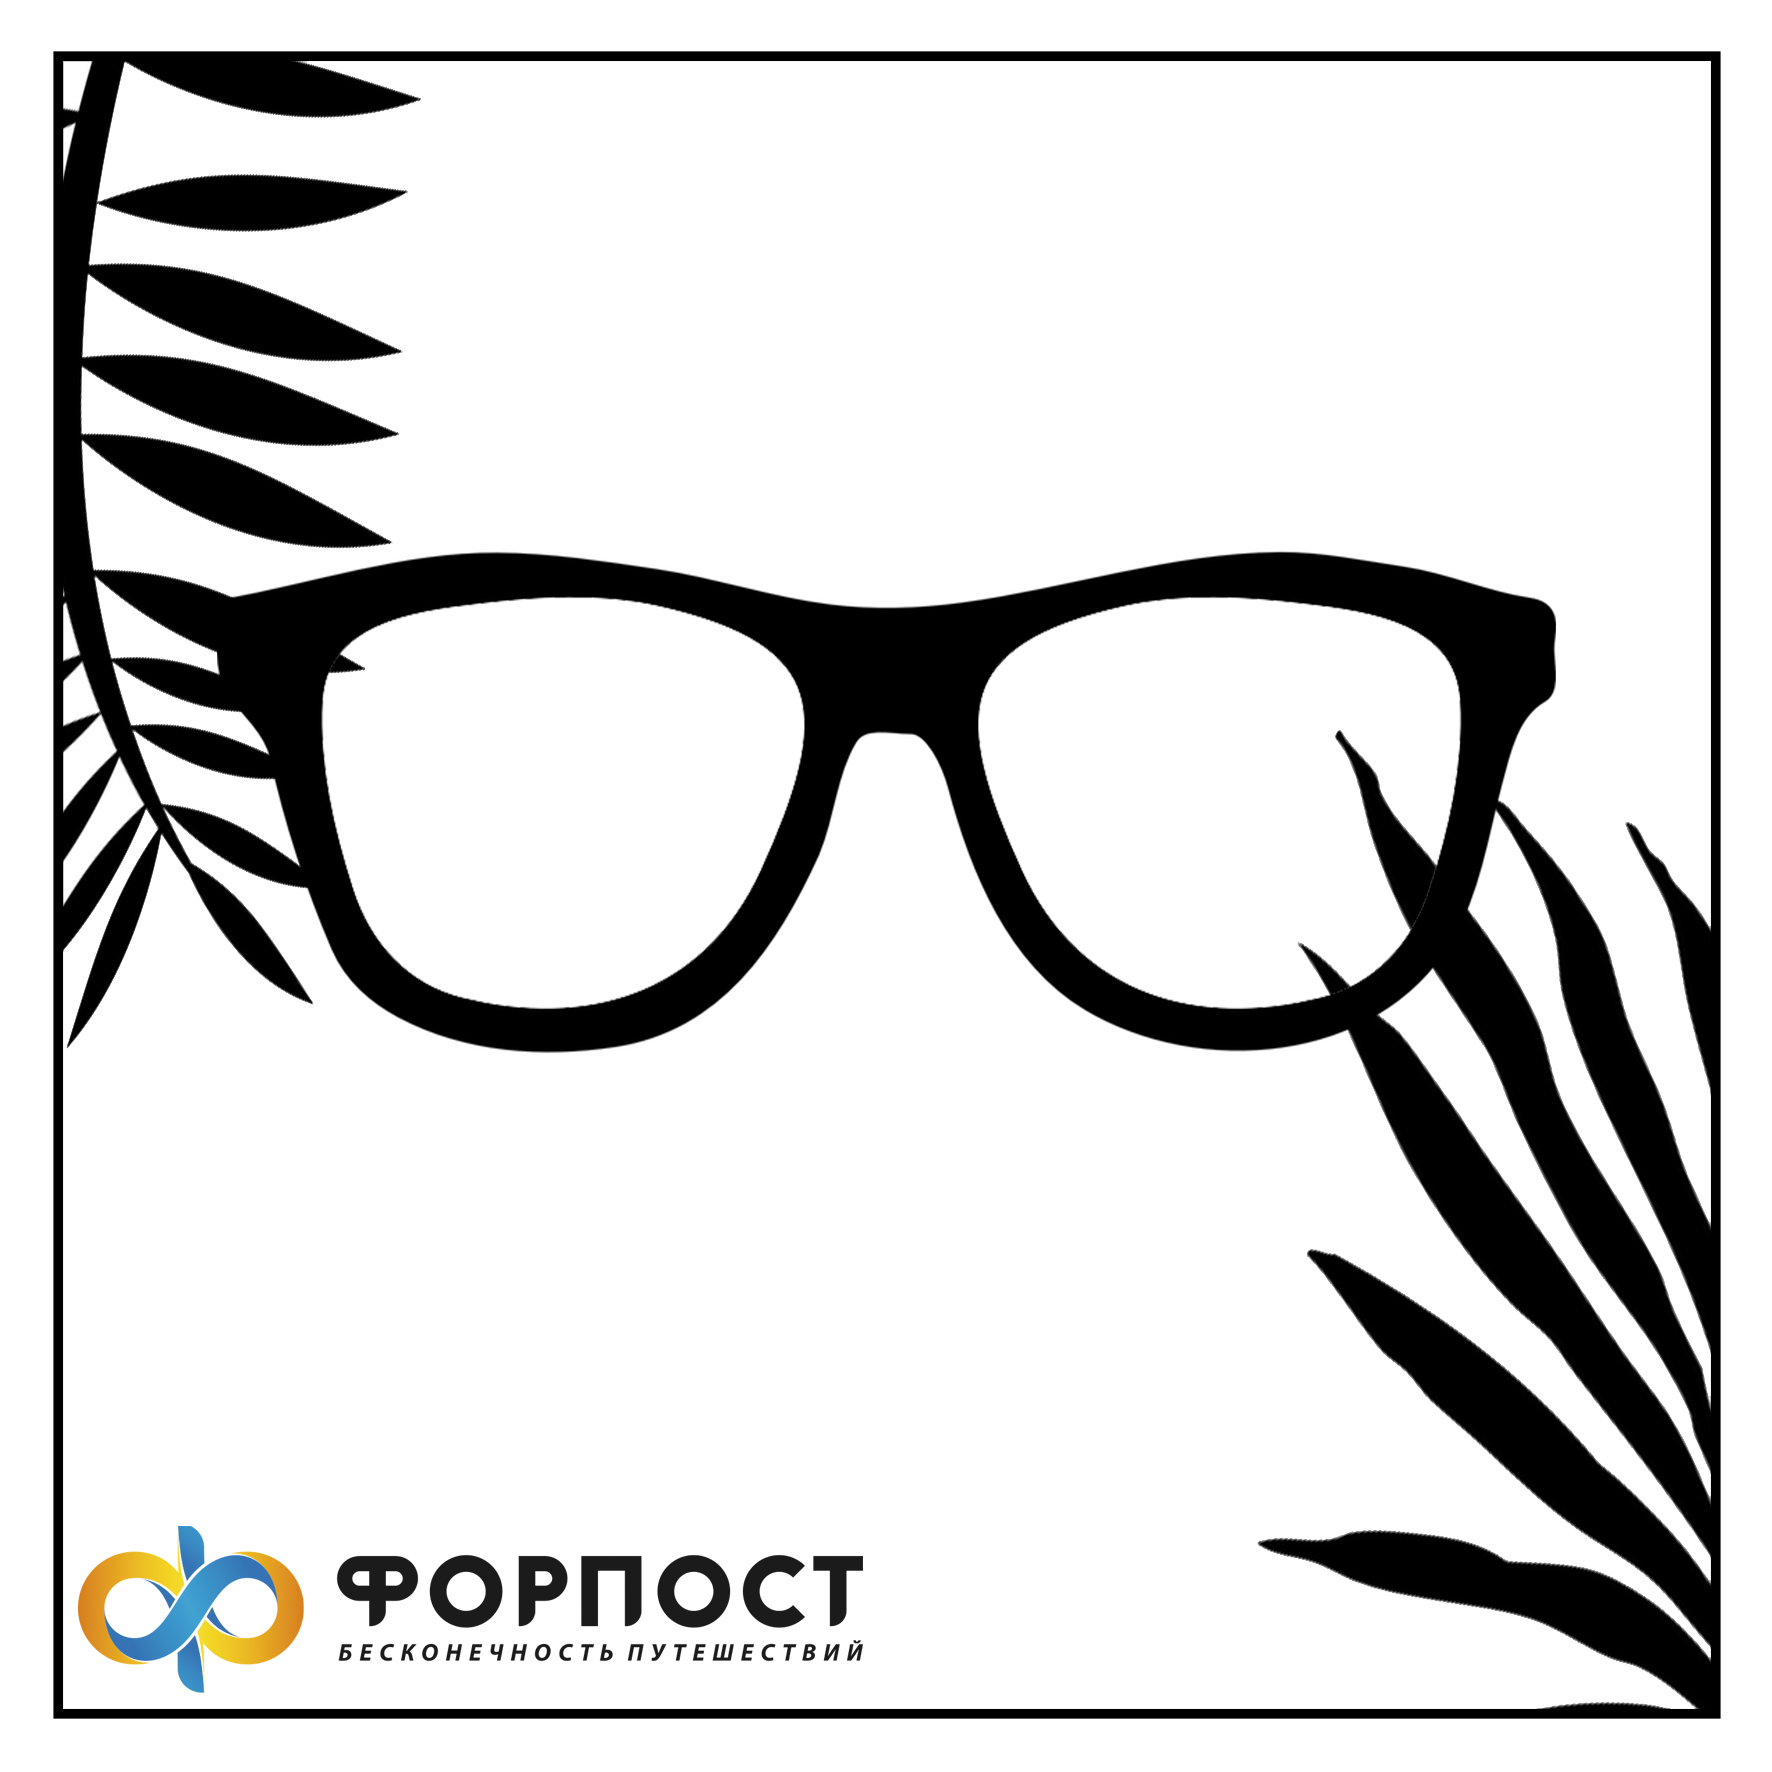 Дизайн флаера на прозрачном пластике фото f_8105ba26d093e2c7.jpg